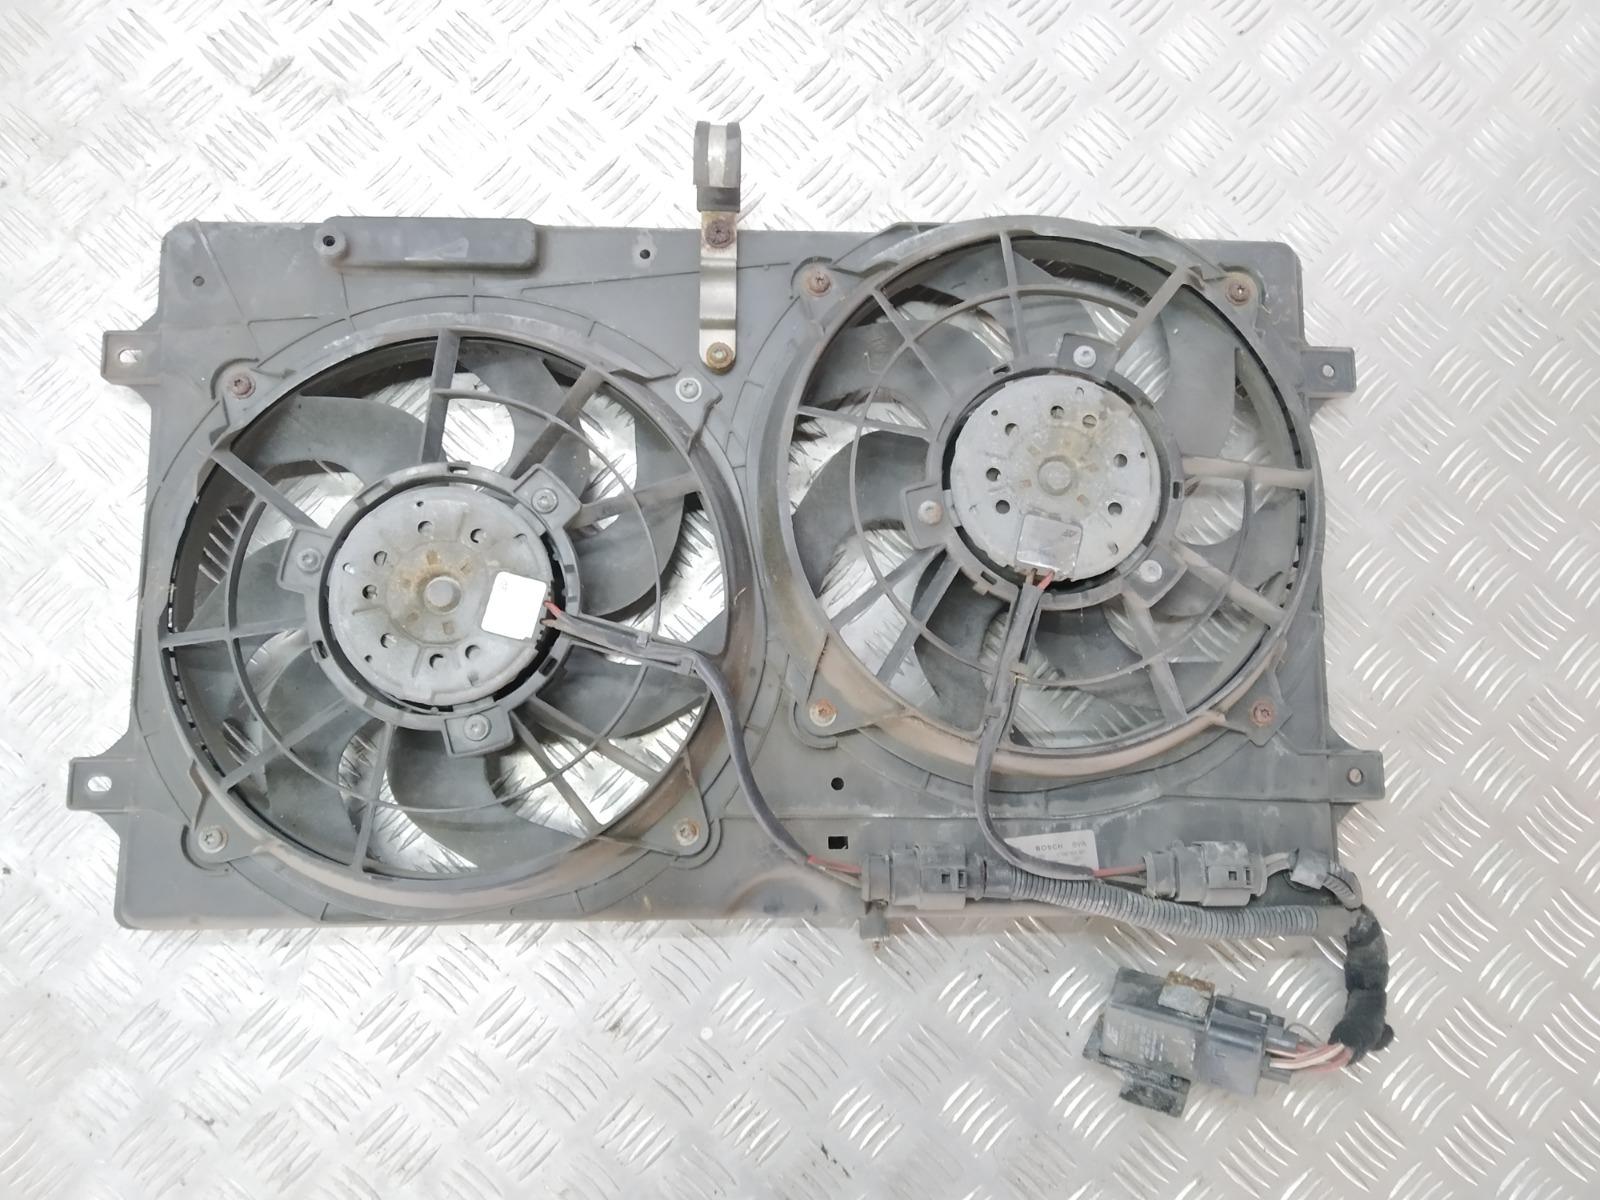 Вентилятор радиатора Volkswagen Sharan 1.9 TDI 2002 (б/у)